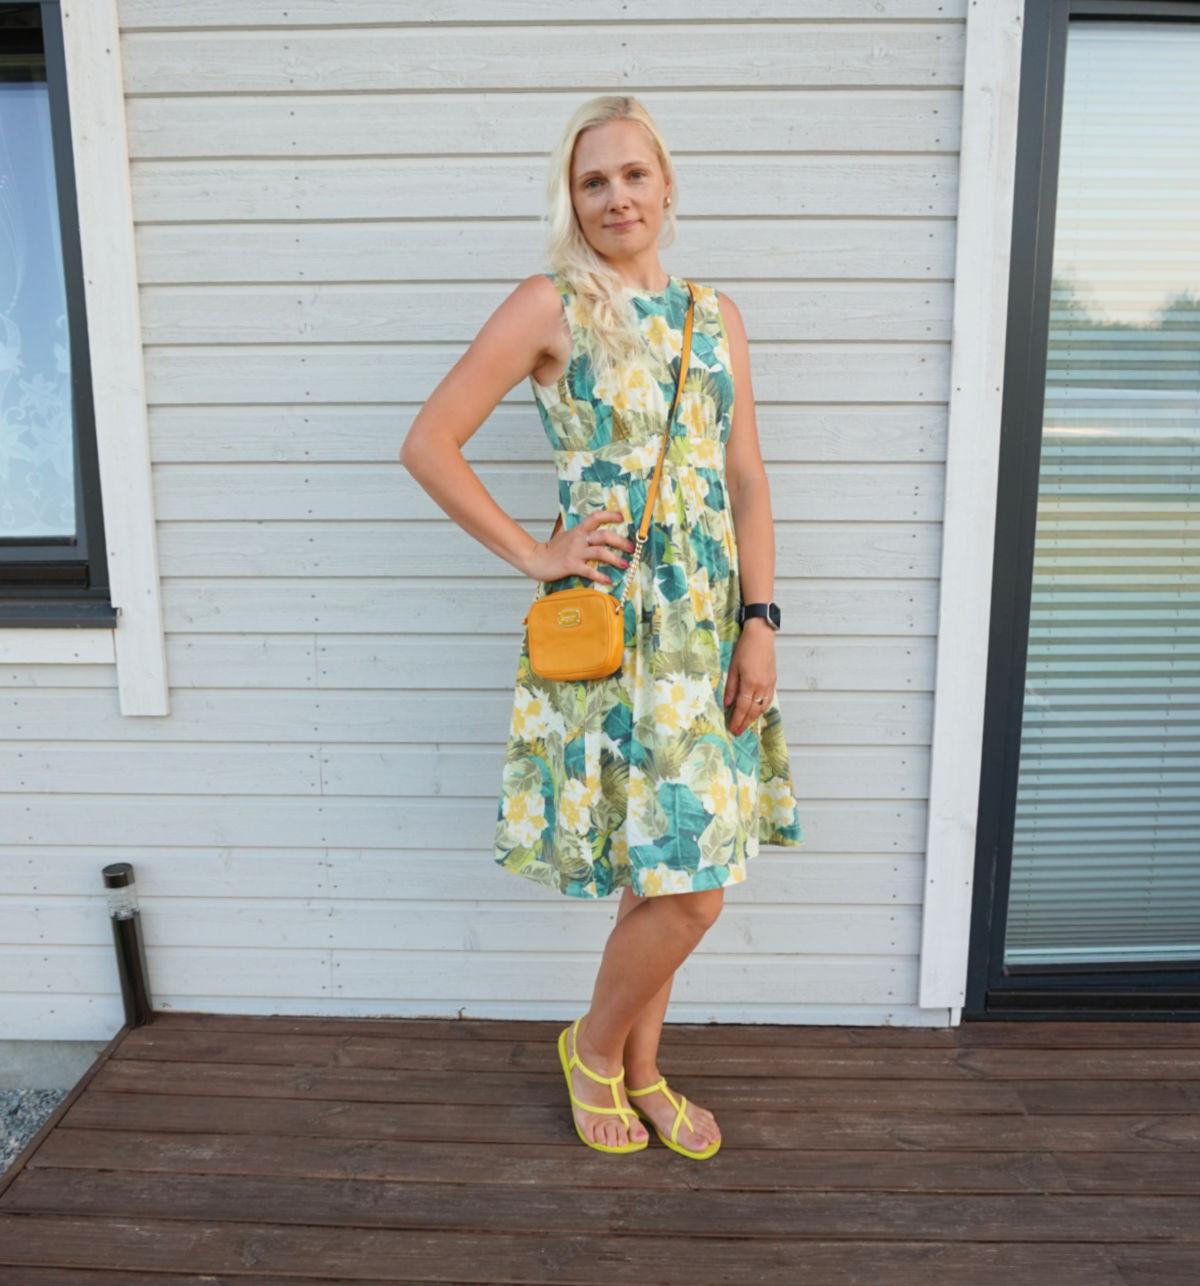 FLoral print midi dress with pockets, yellow Ipanema sandals, yellow Michael Kors bag